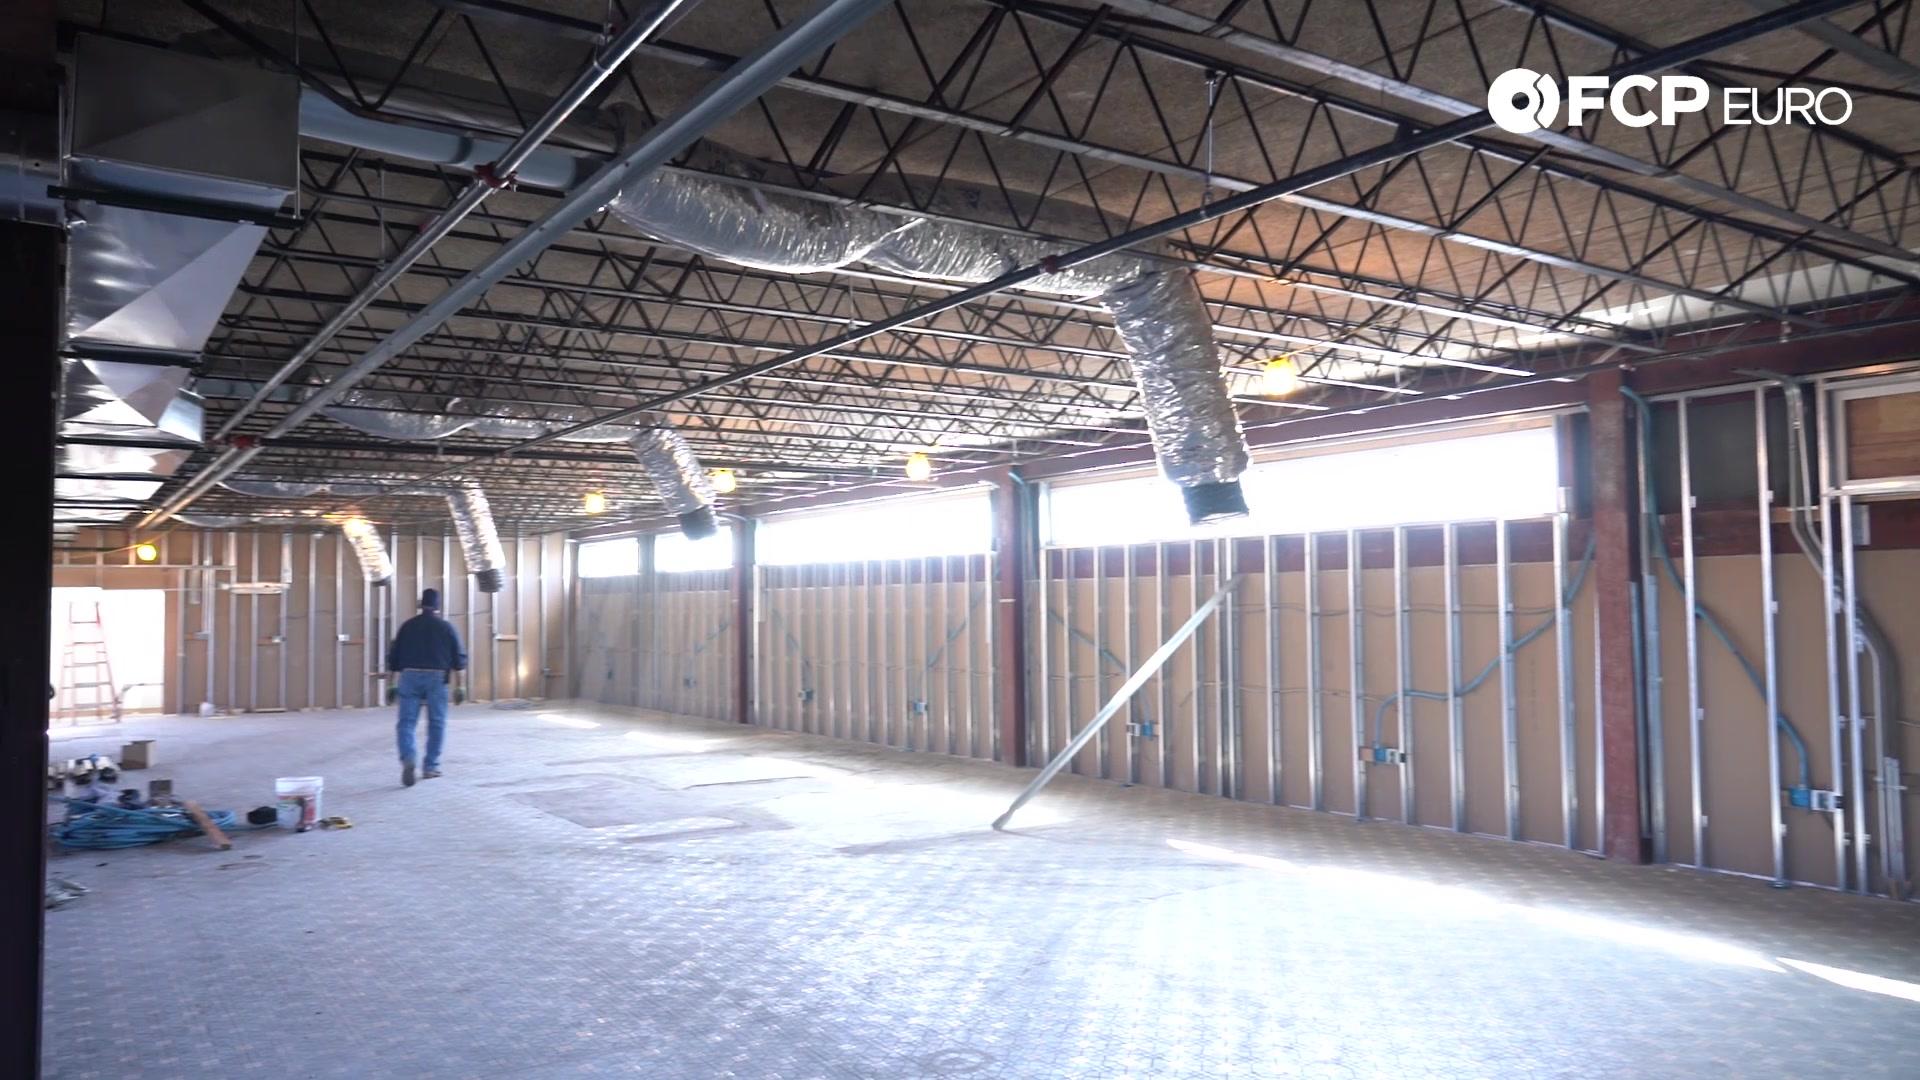 Mezzanine Under Construction